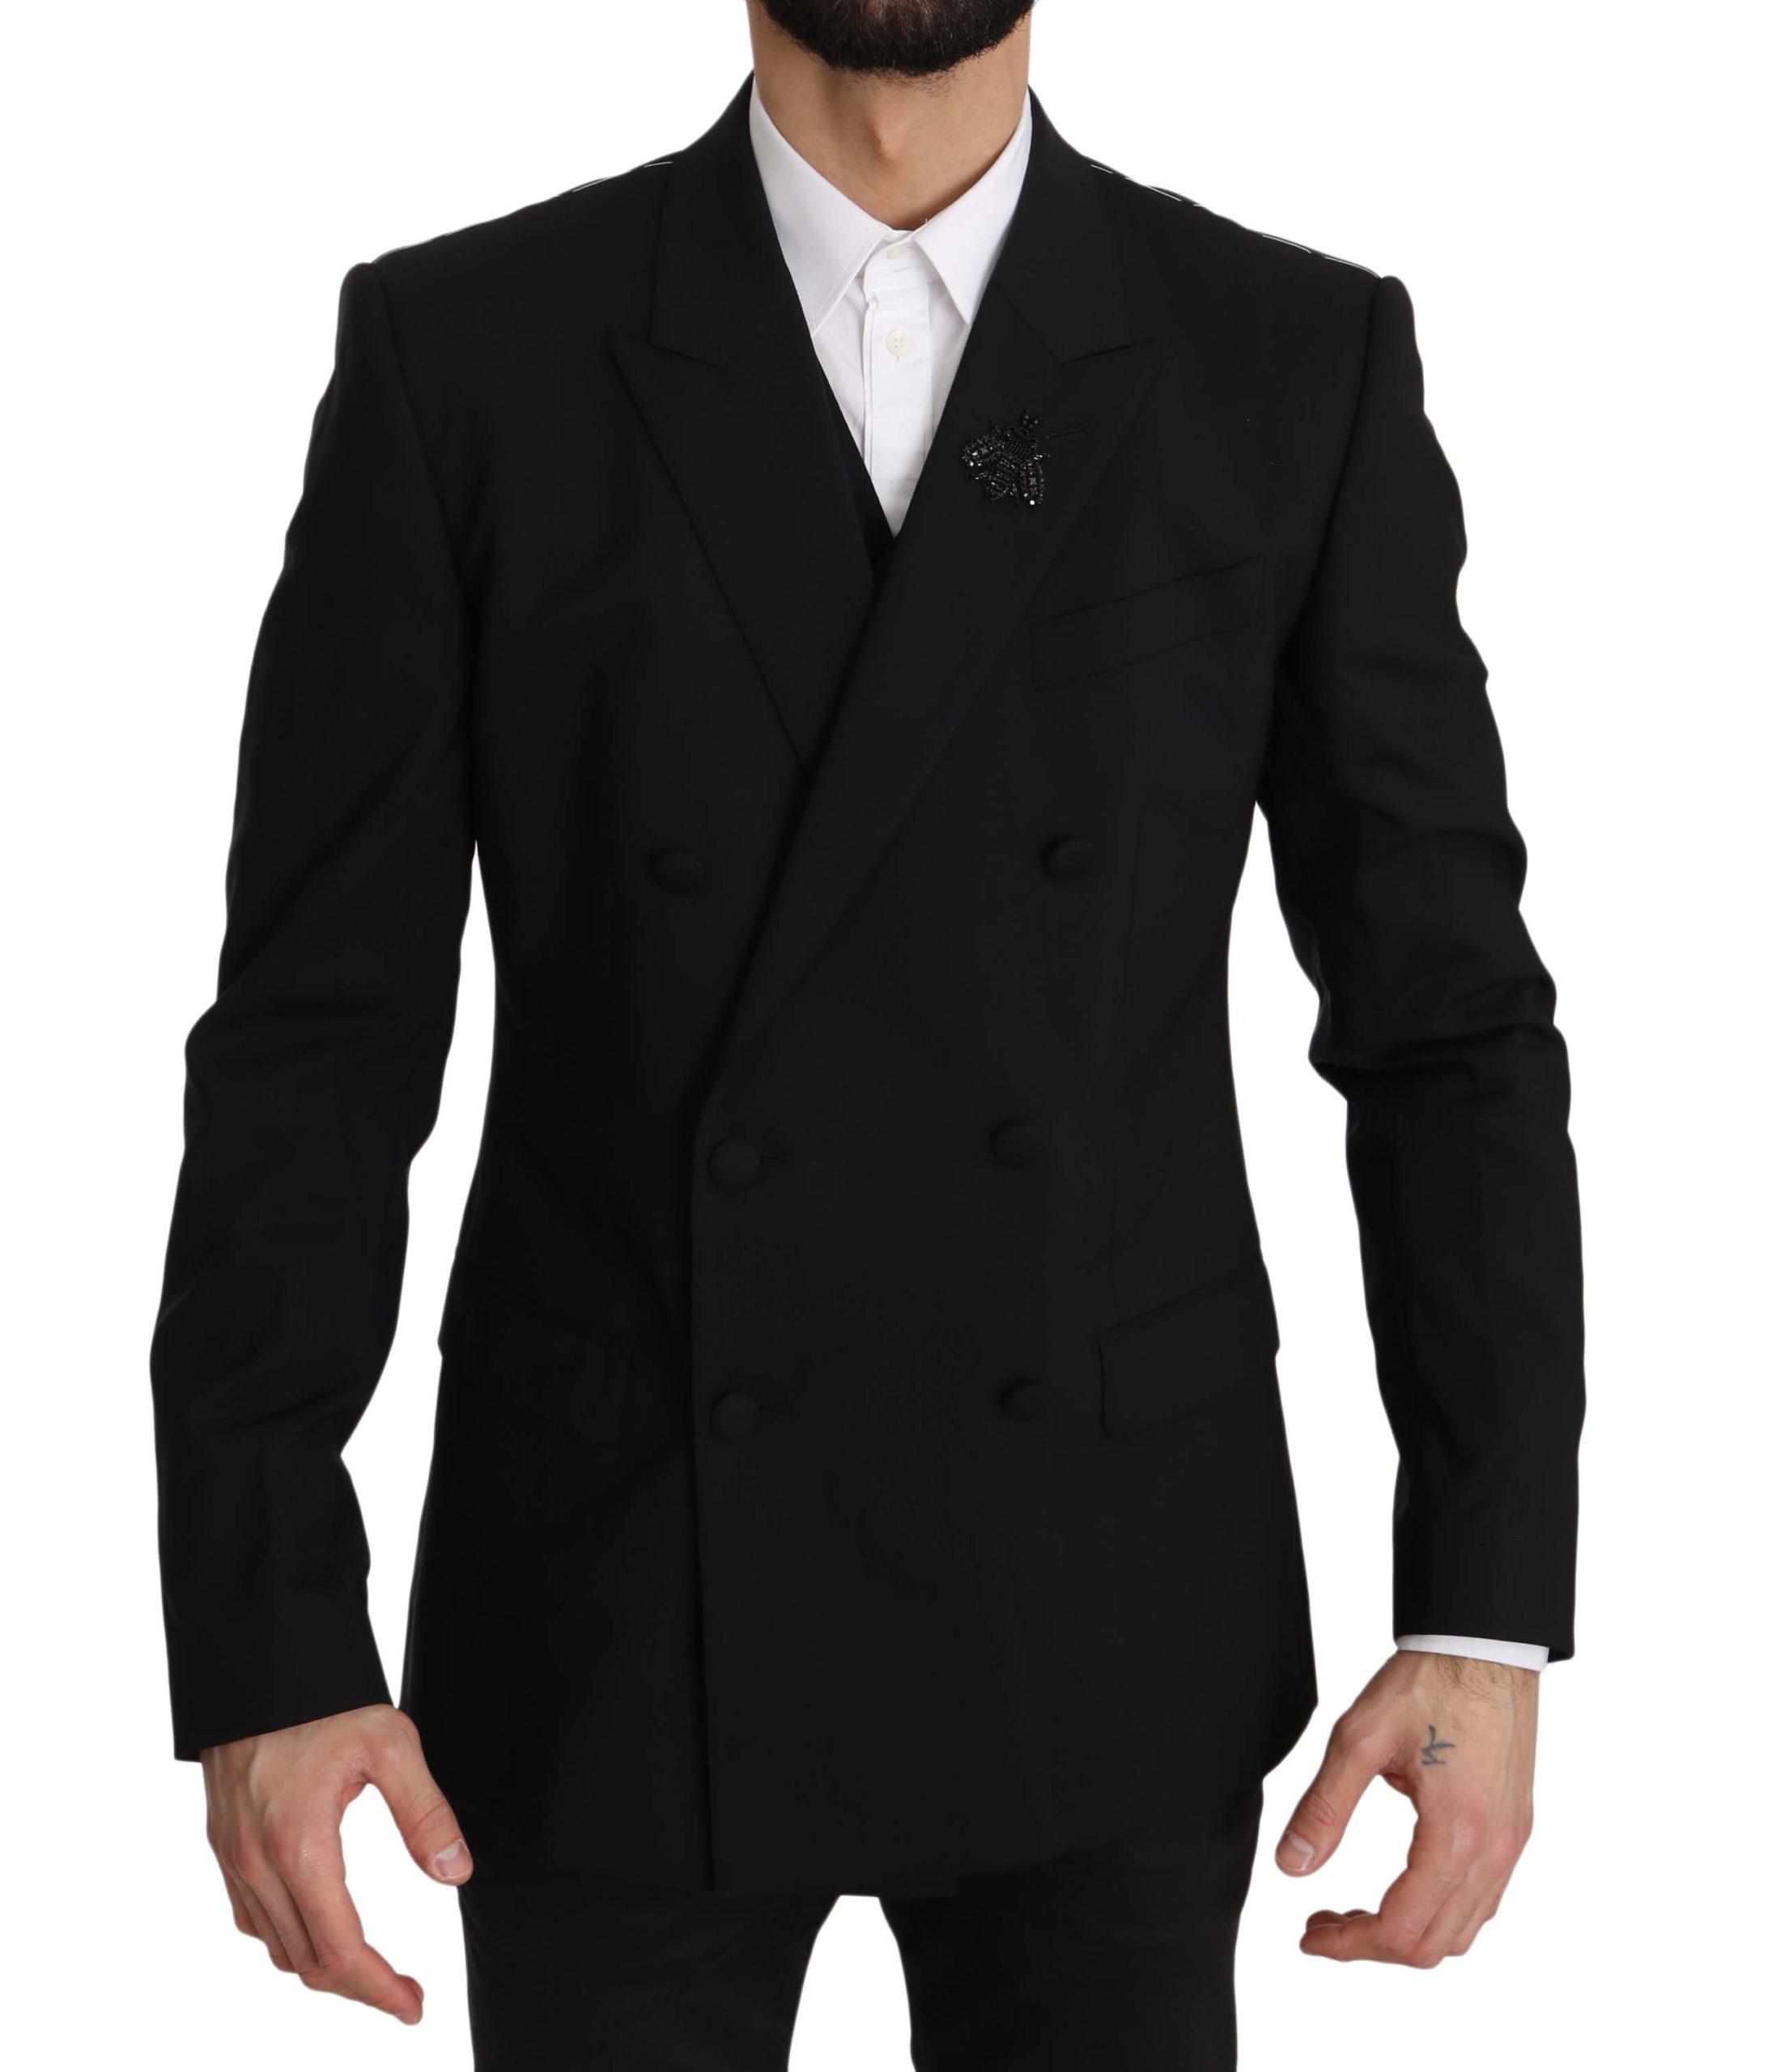 Dolce & Gabbana Men's Blazer Black JKT2383 - IT50 | L